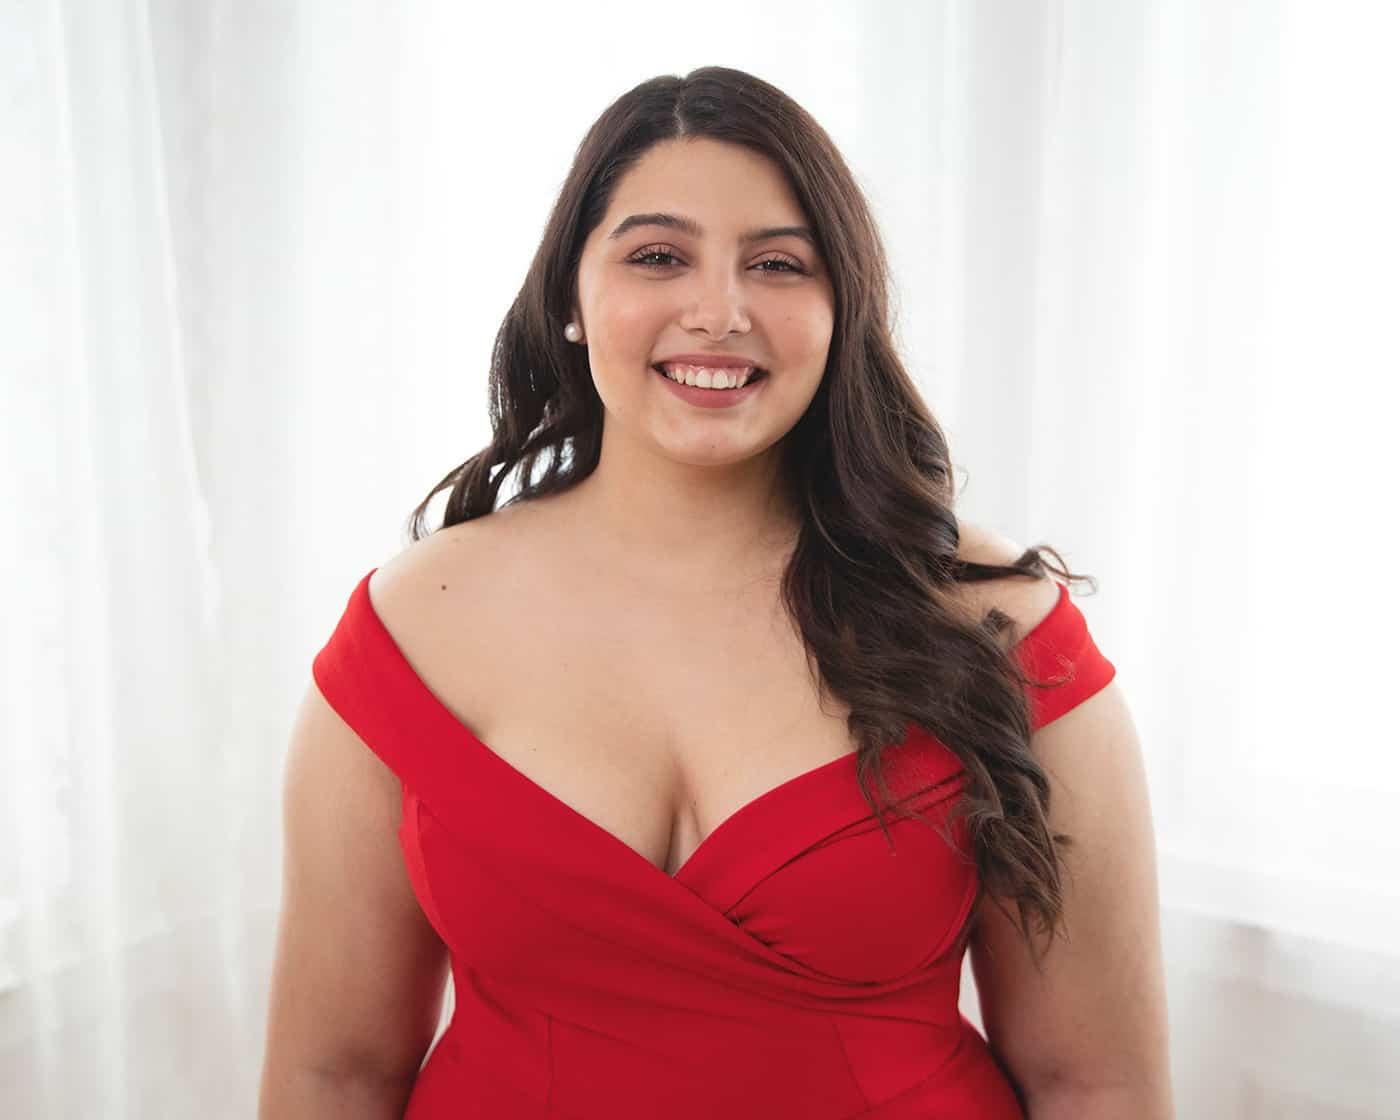 mosolygos-hunyoritos-portre-studioban-piros-ruha